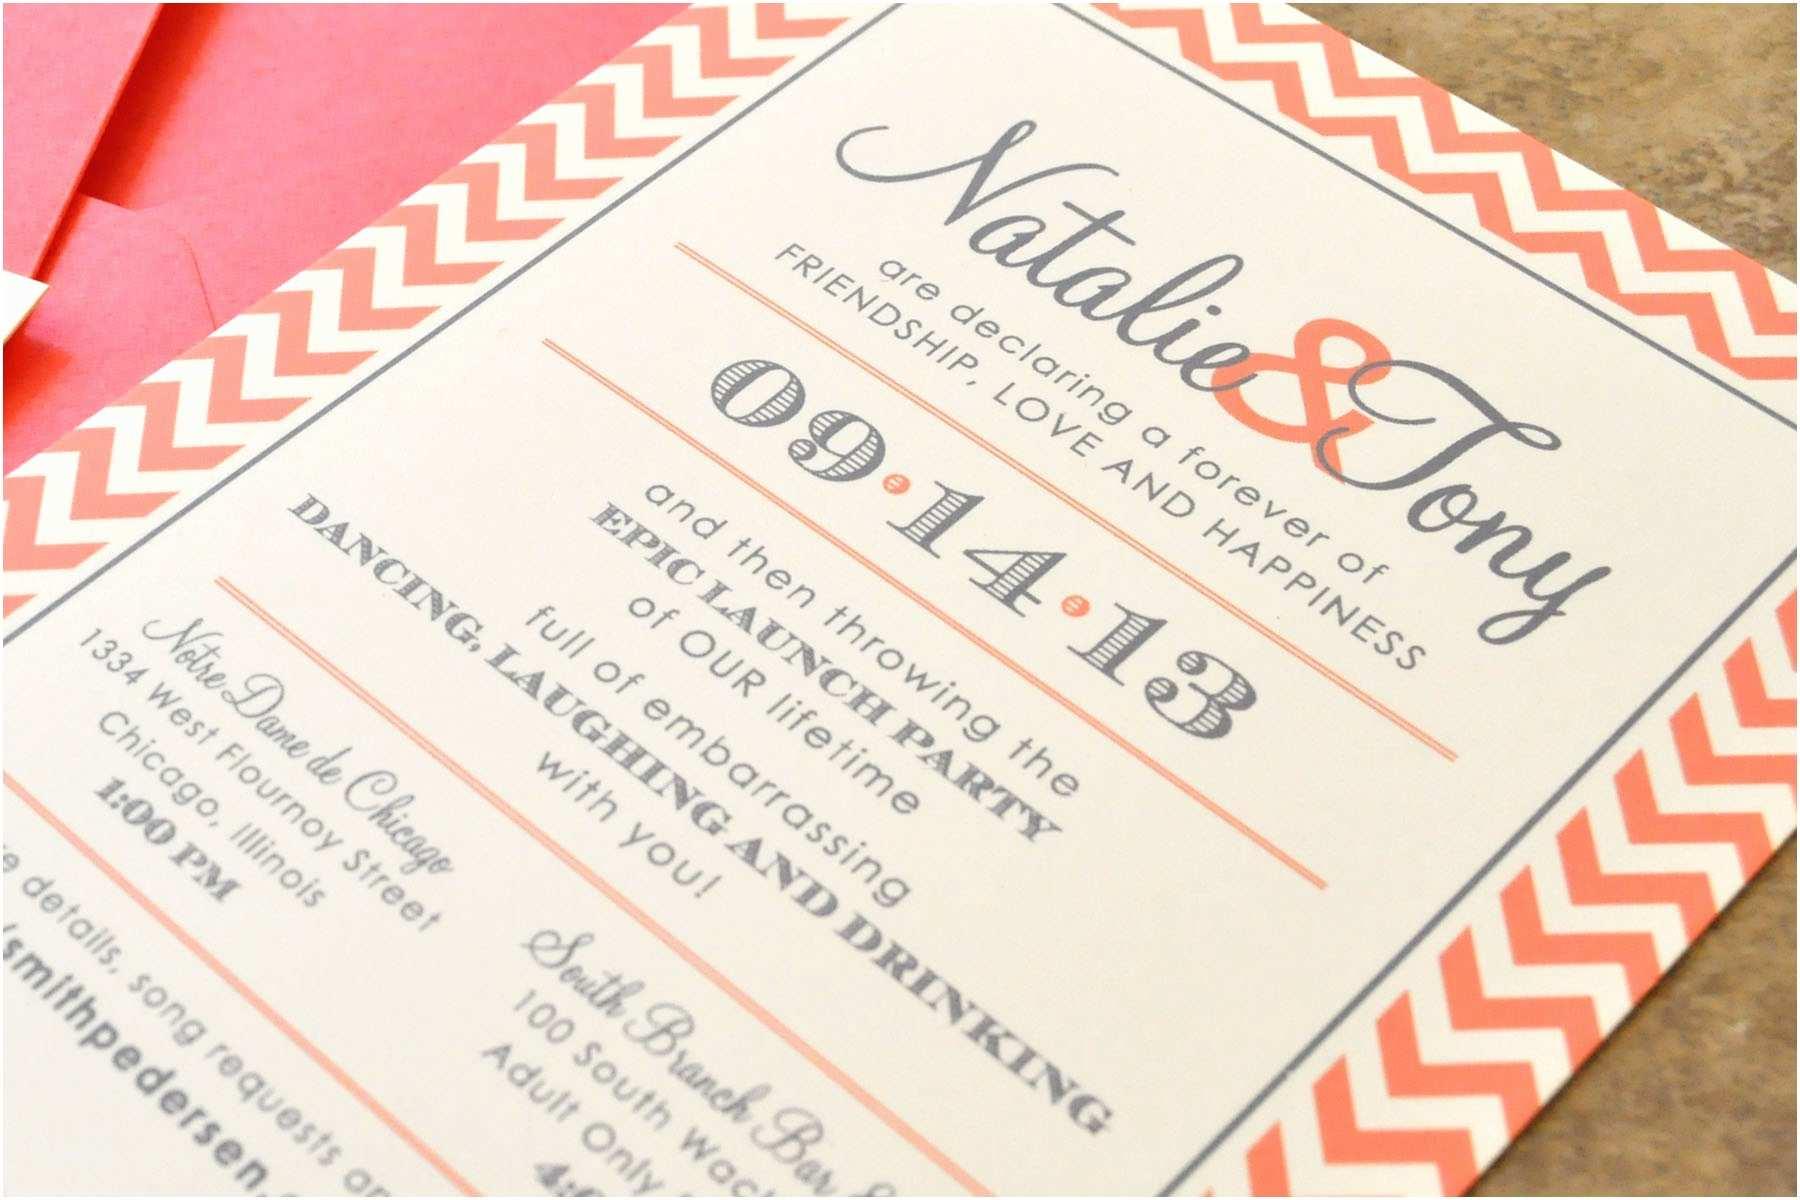 Page Wedding Invitations Wedding Invitations Square Pattern orange Borders Black